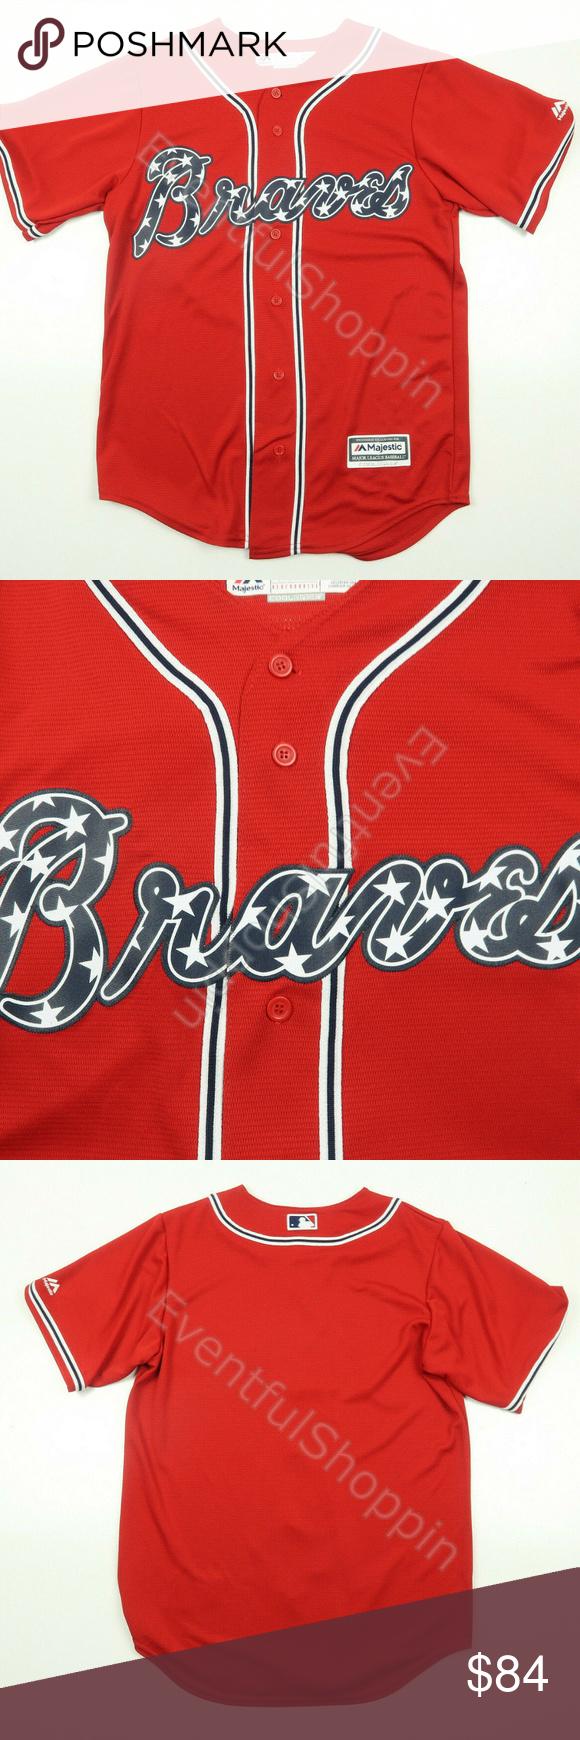 Atlanta Braves Red Stars Stripes Home Jersey Majestic Shirts Clothes Design Fashion